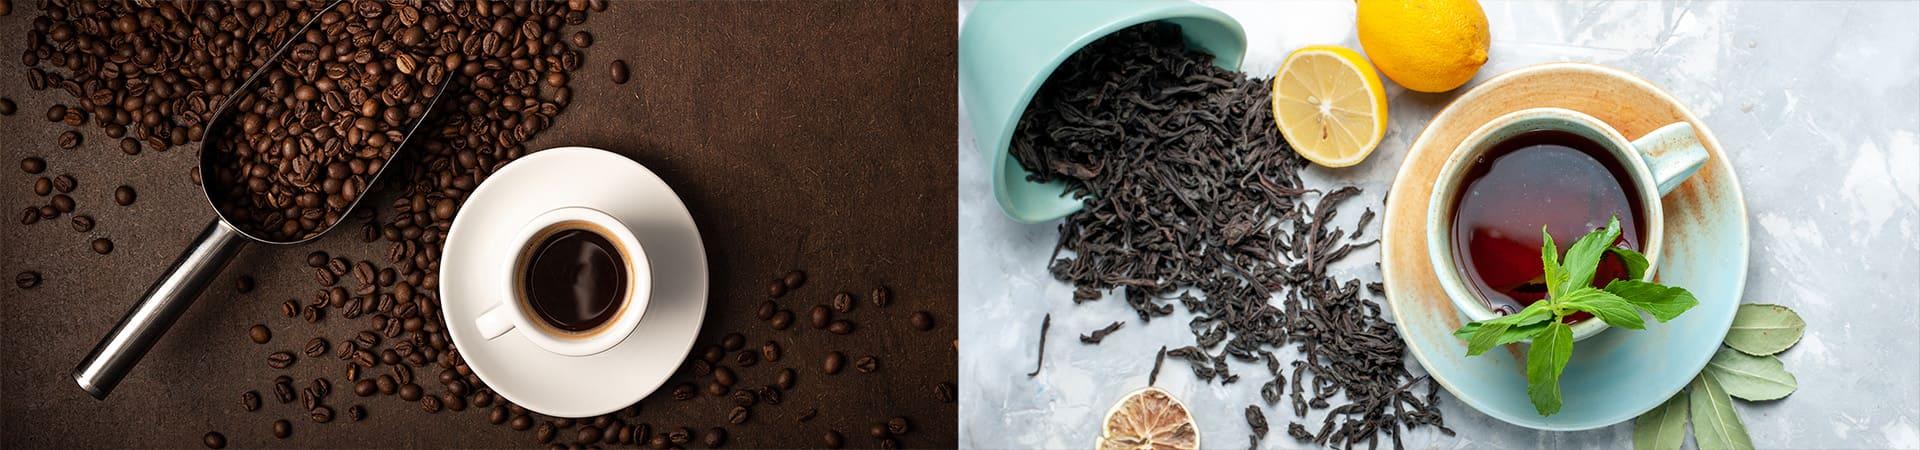 Coffee and Tea Manufacturing